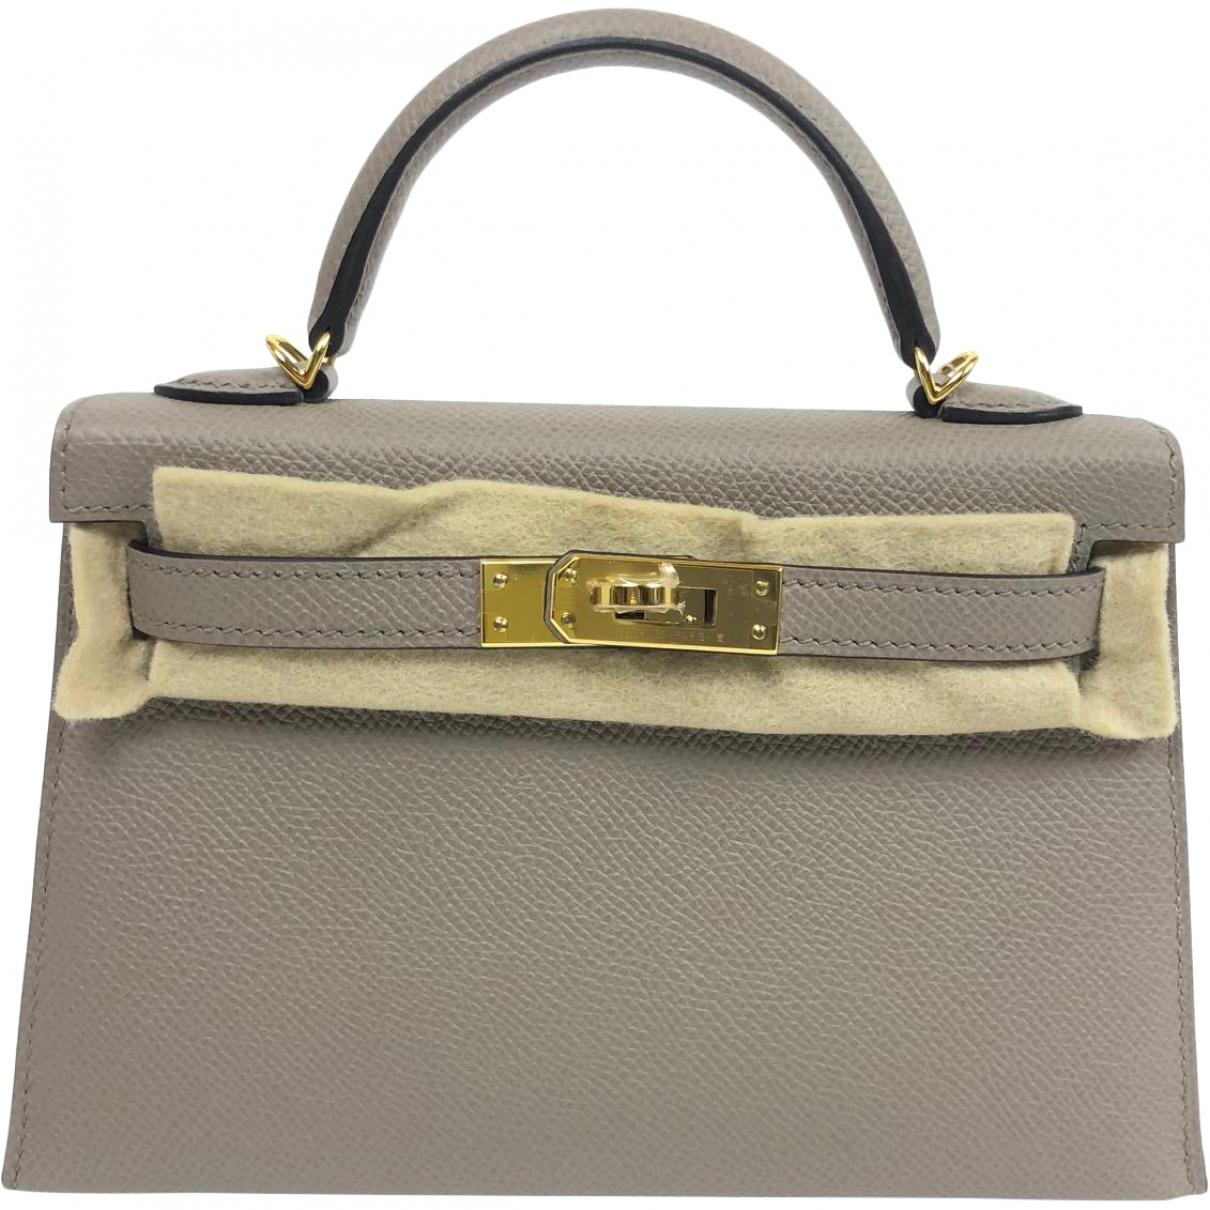 91225d62b4ed Lyst - Hermès Kelly Mini Grey Leather Handbag in Gray